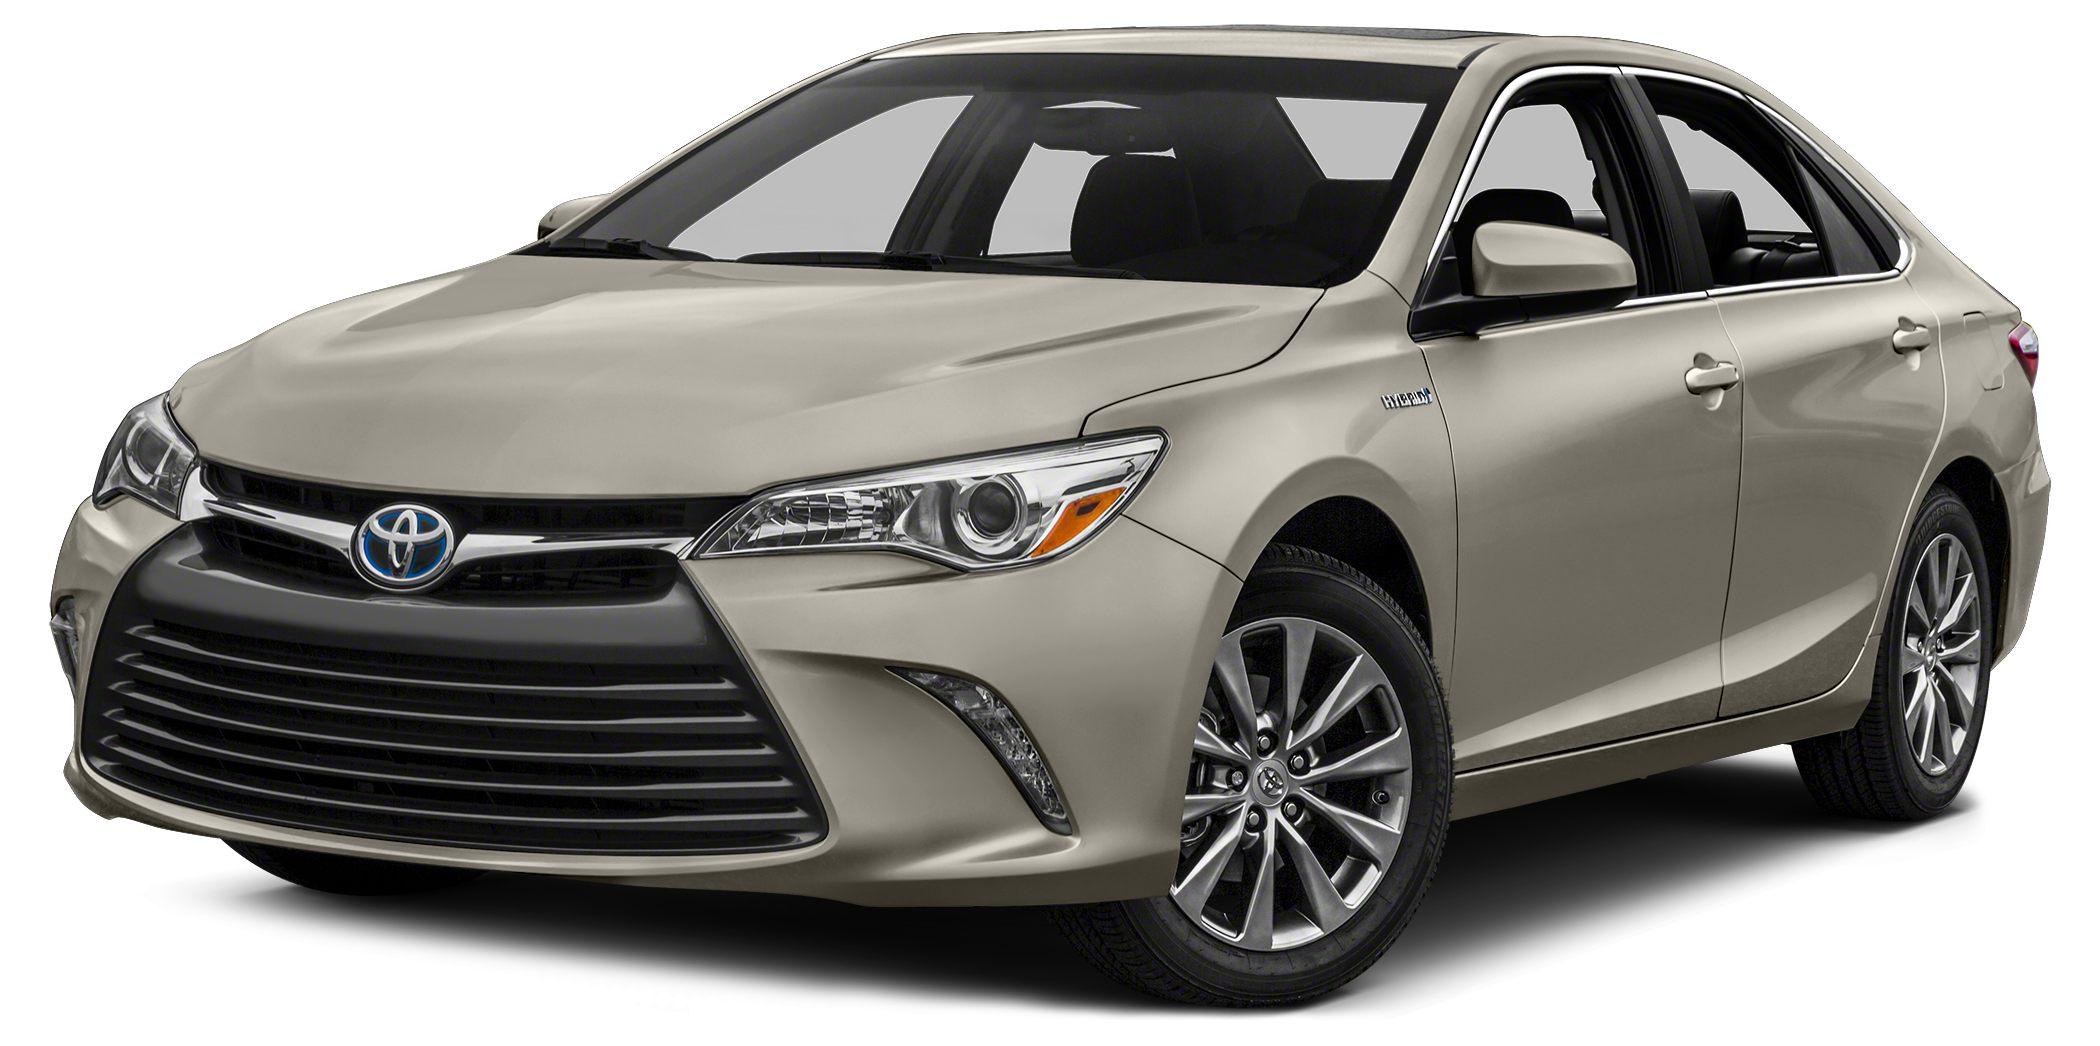 2017 Toyota Camry Hybrid XLE Heated Leather Seats Keyless Start Dual Zone AC Hybrid Alloy Whe